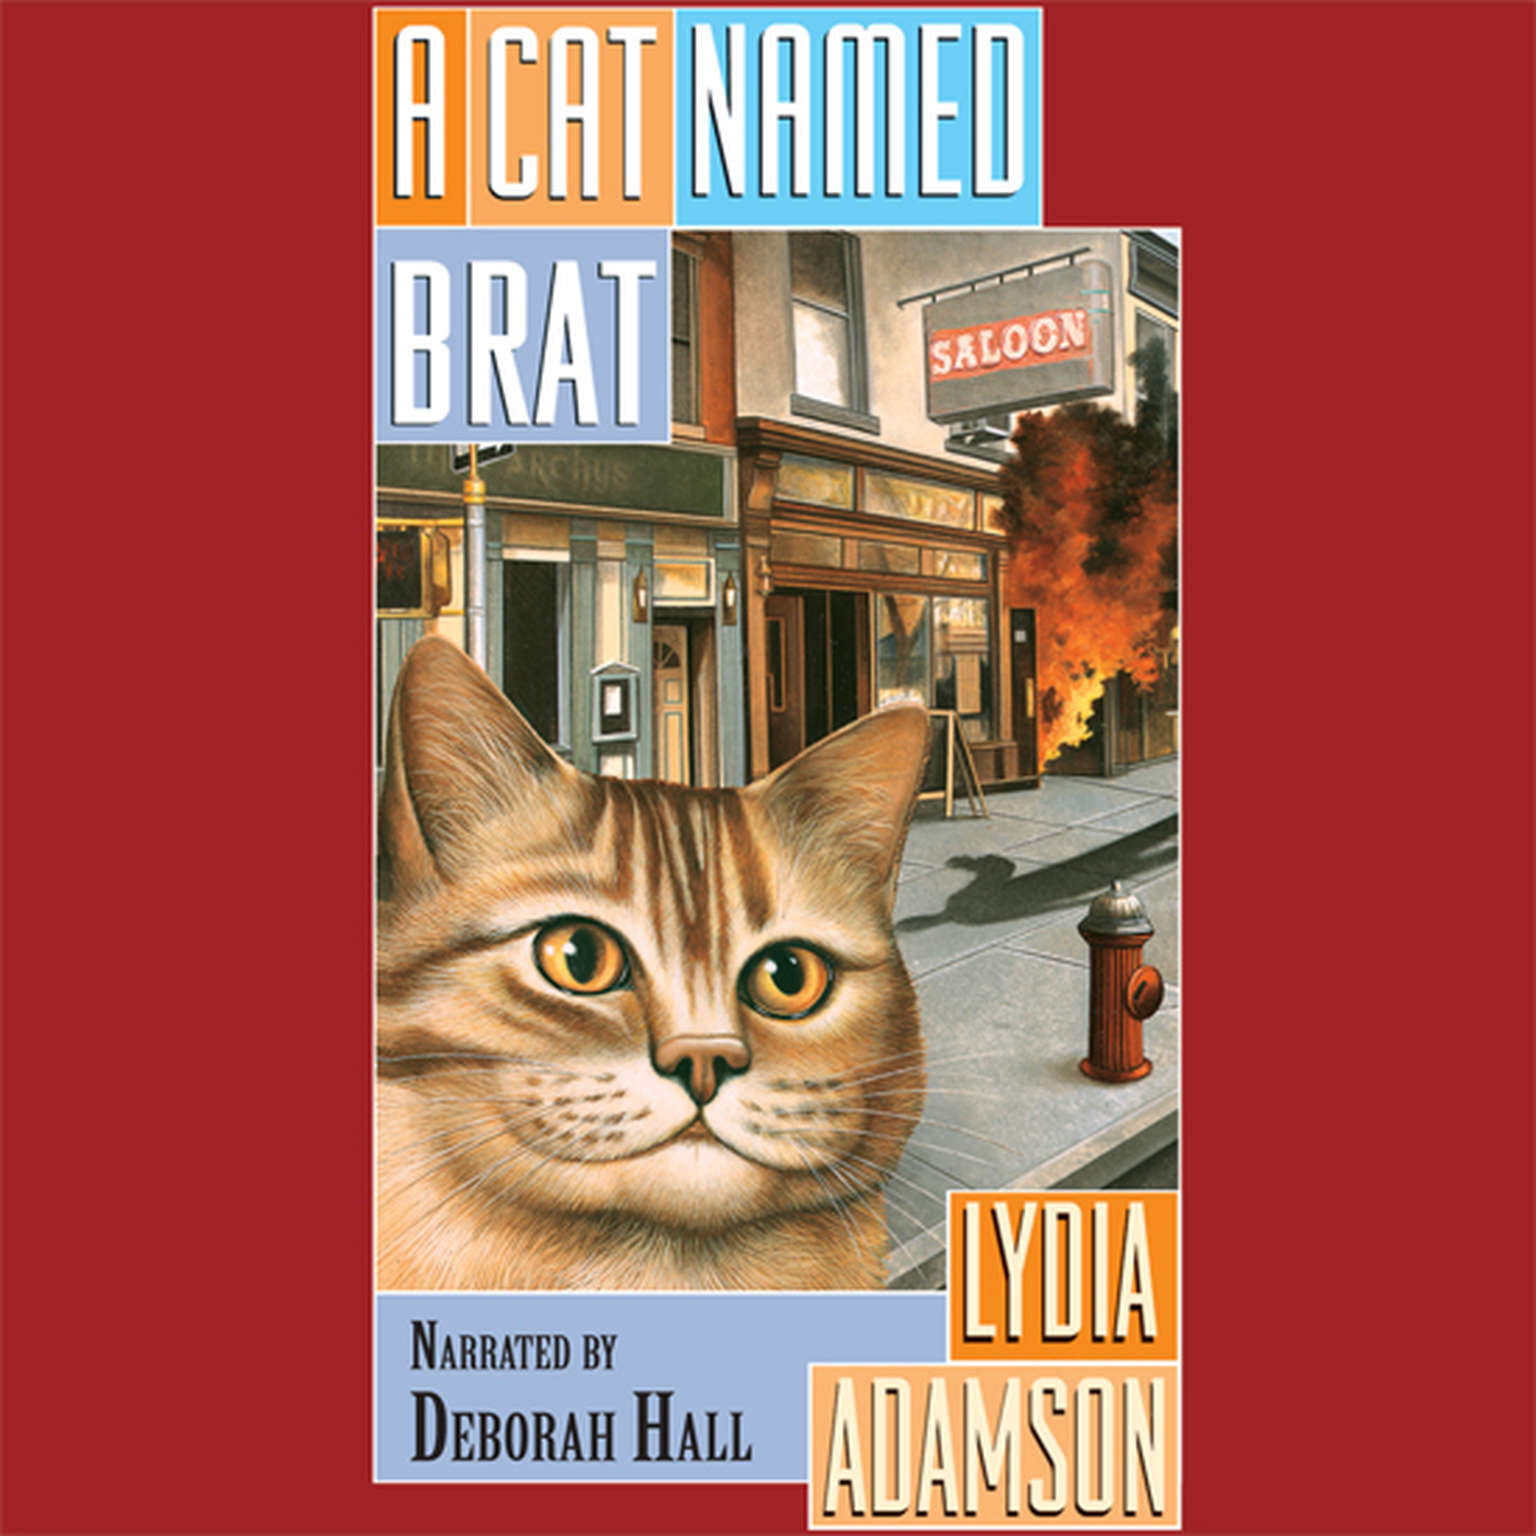 A Cat Named Brat Audiobook, by Lydia Adamson